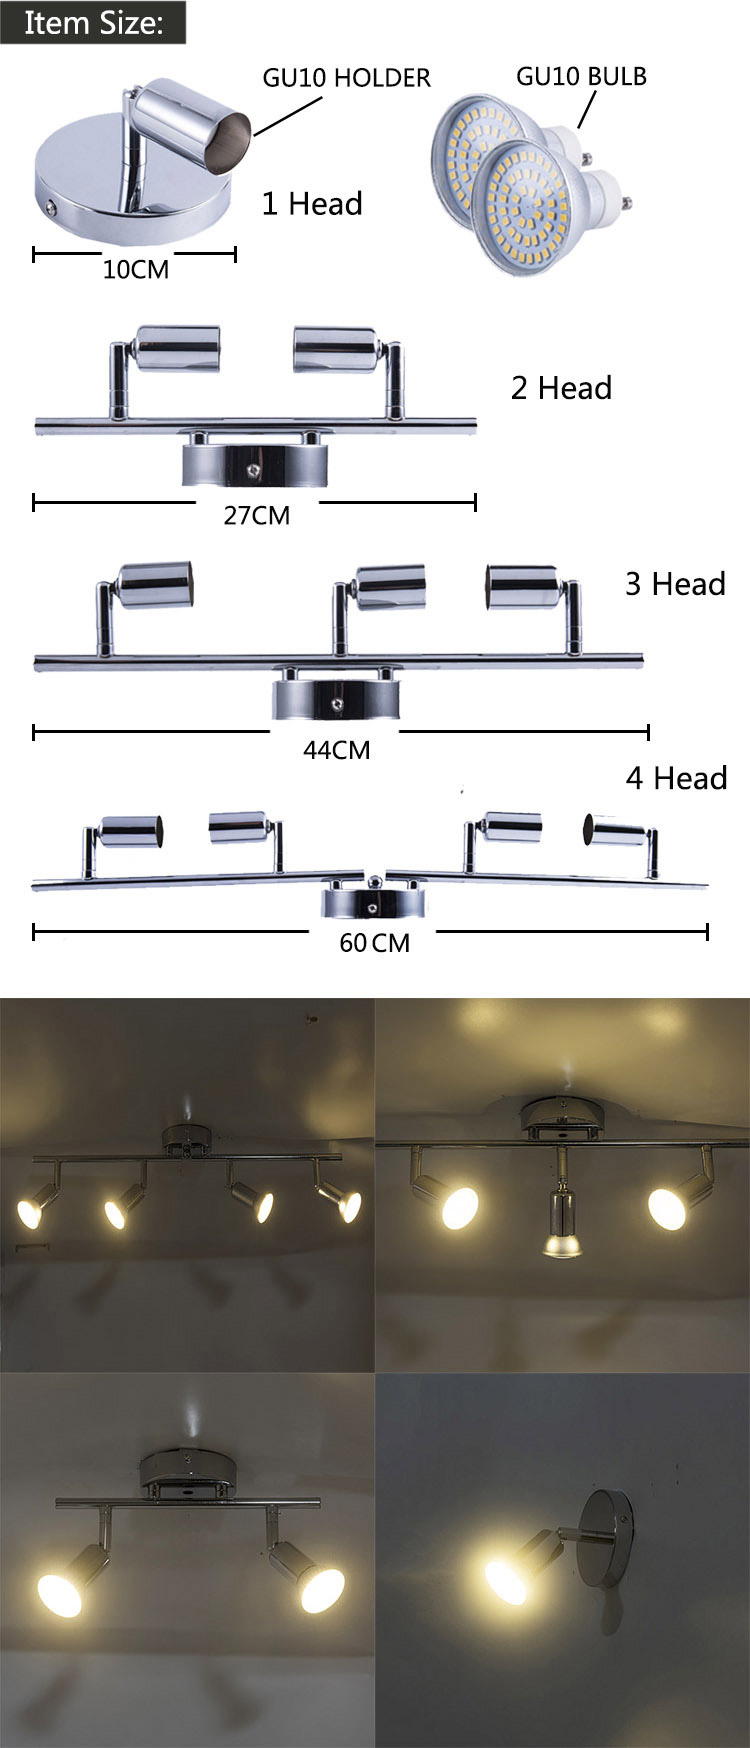 HTB1T.QjLHvpK1RjSZFqq6AXUVXaG angle adjustable Rotatable led ceiling light showcase with GU10 led bulb Living Room LED cabinet spot lighting